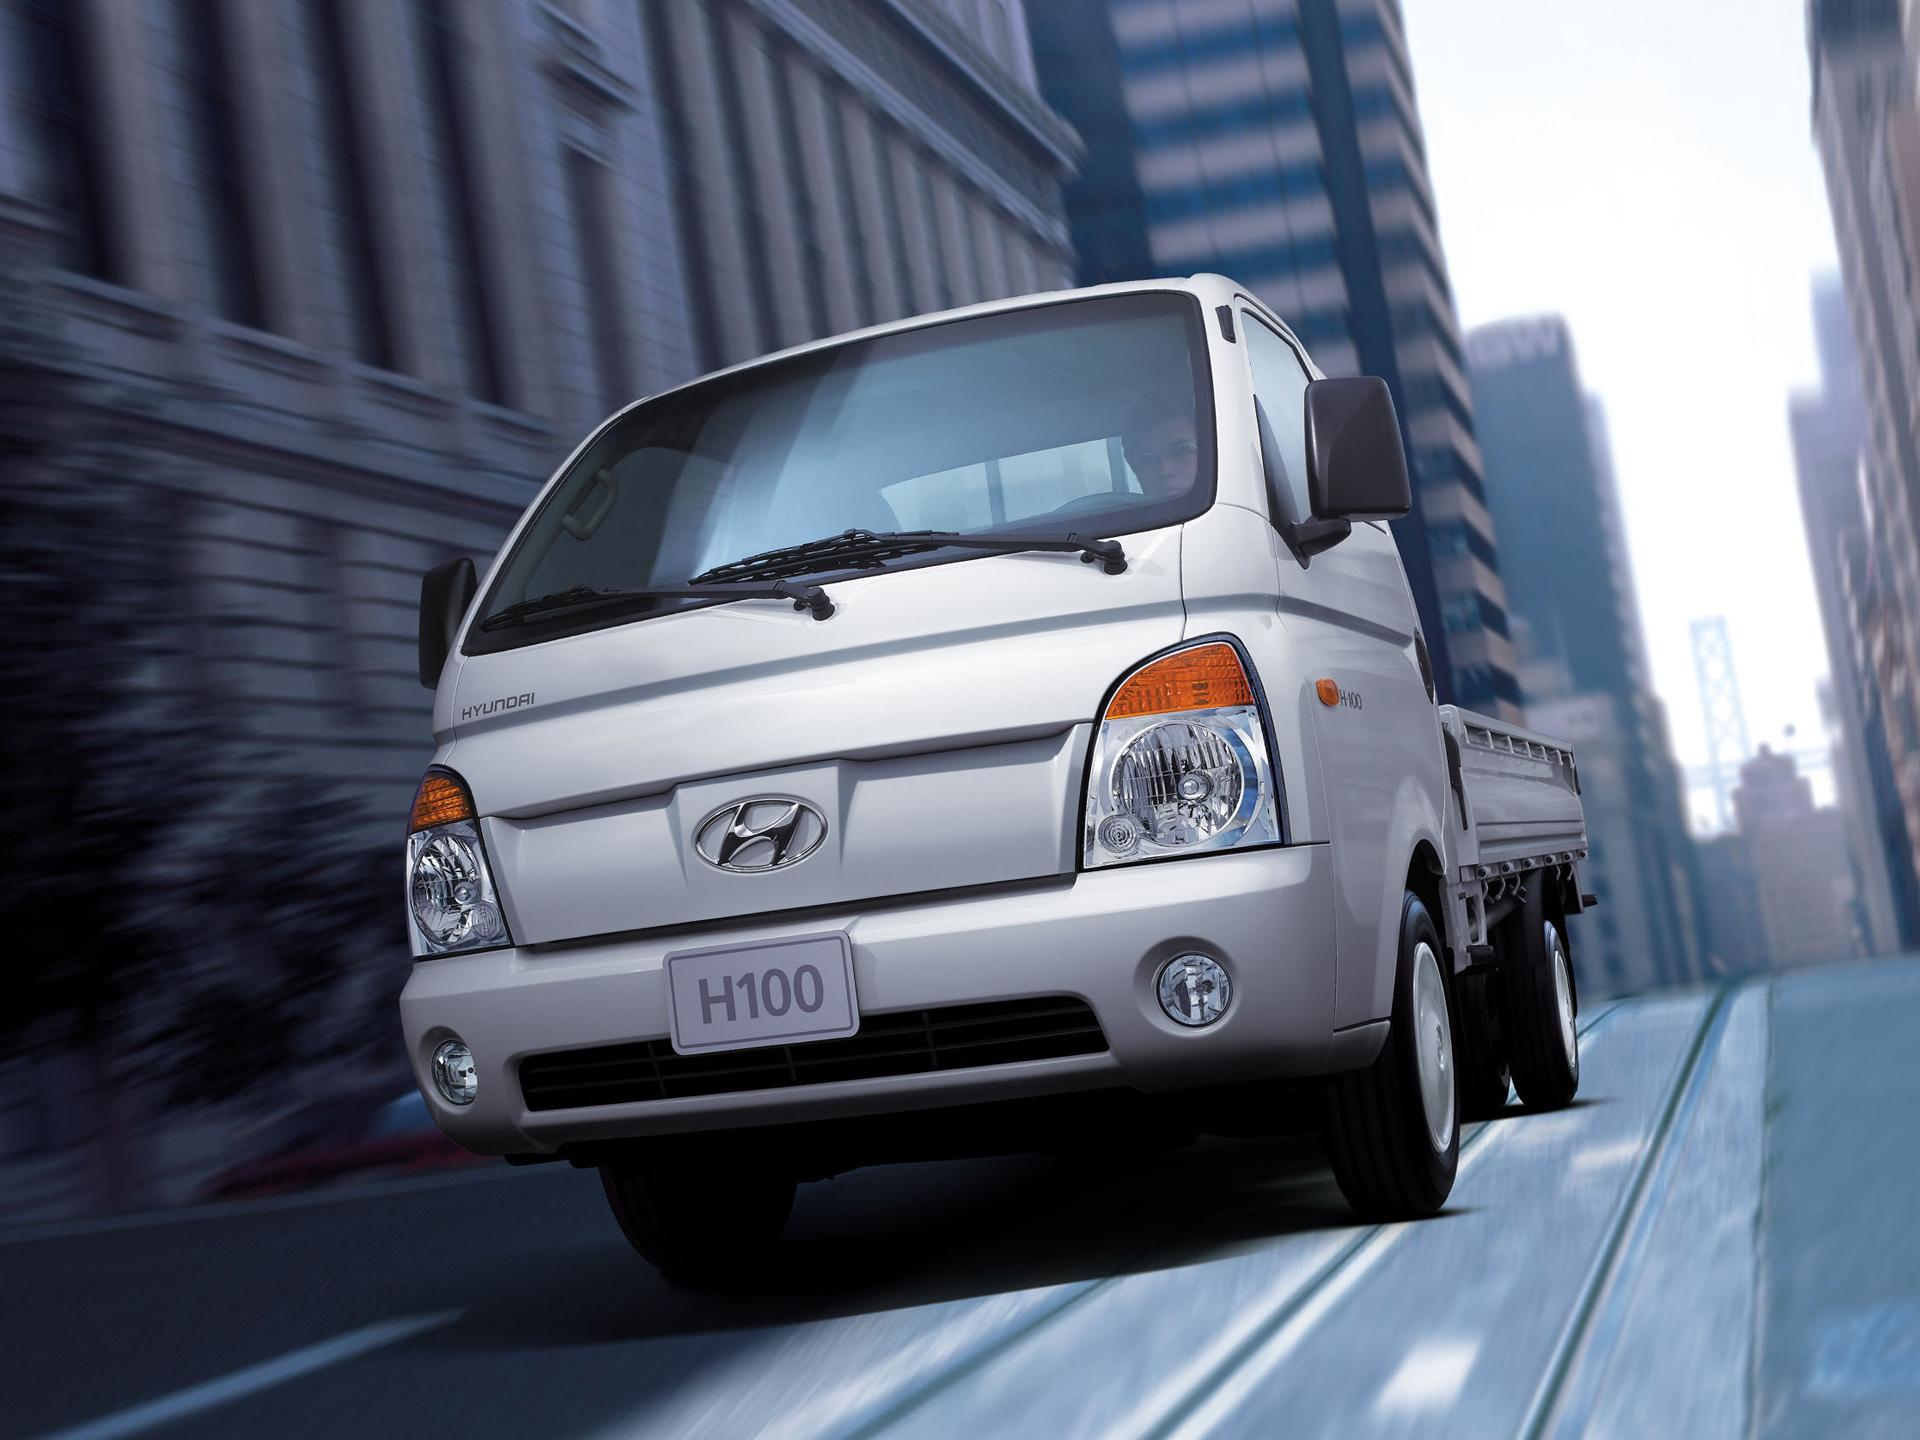 Hyundai H100 photos - PhotoGallery with 5 pics  CarsBase.com